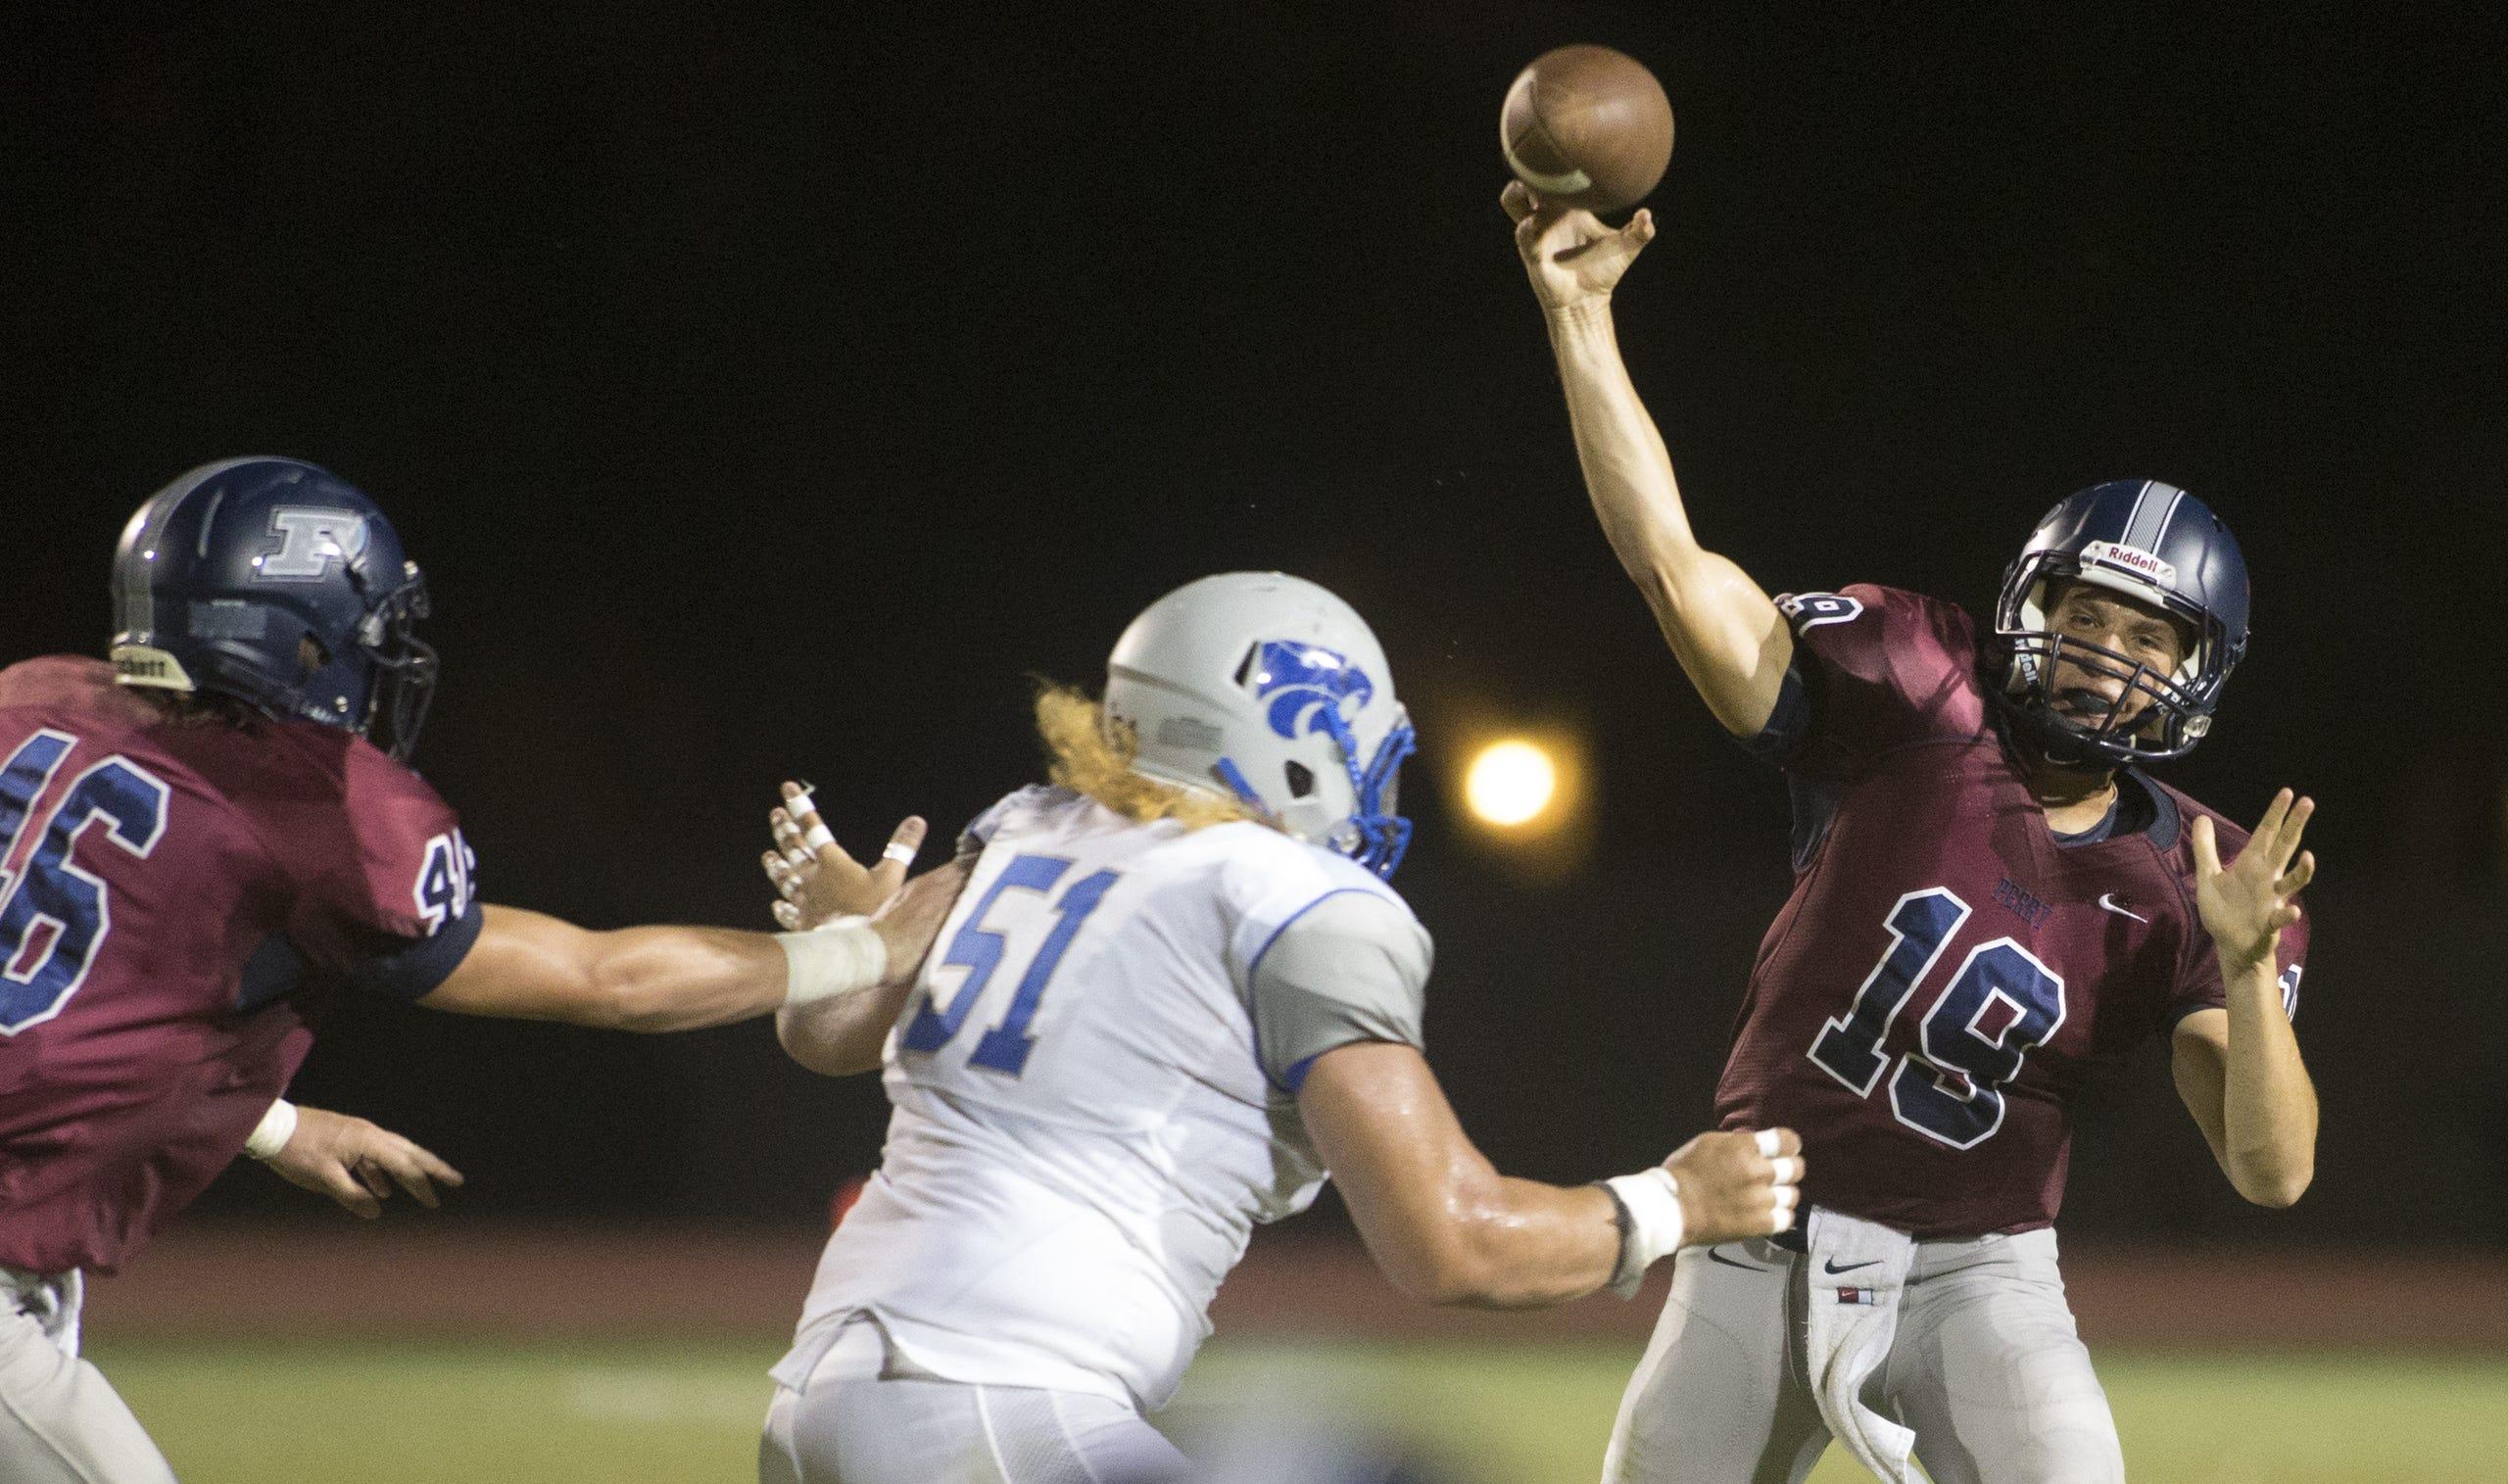 High school football: Mesquite at Gilbert Perry